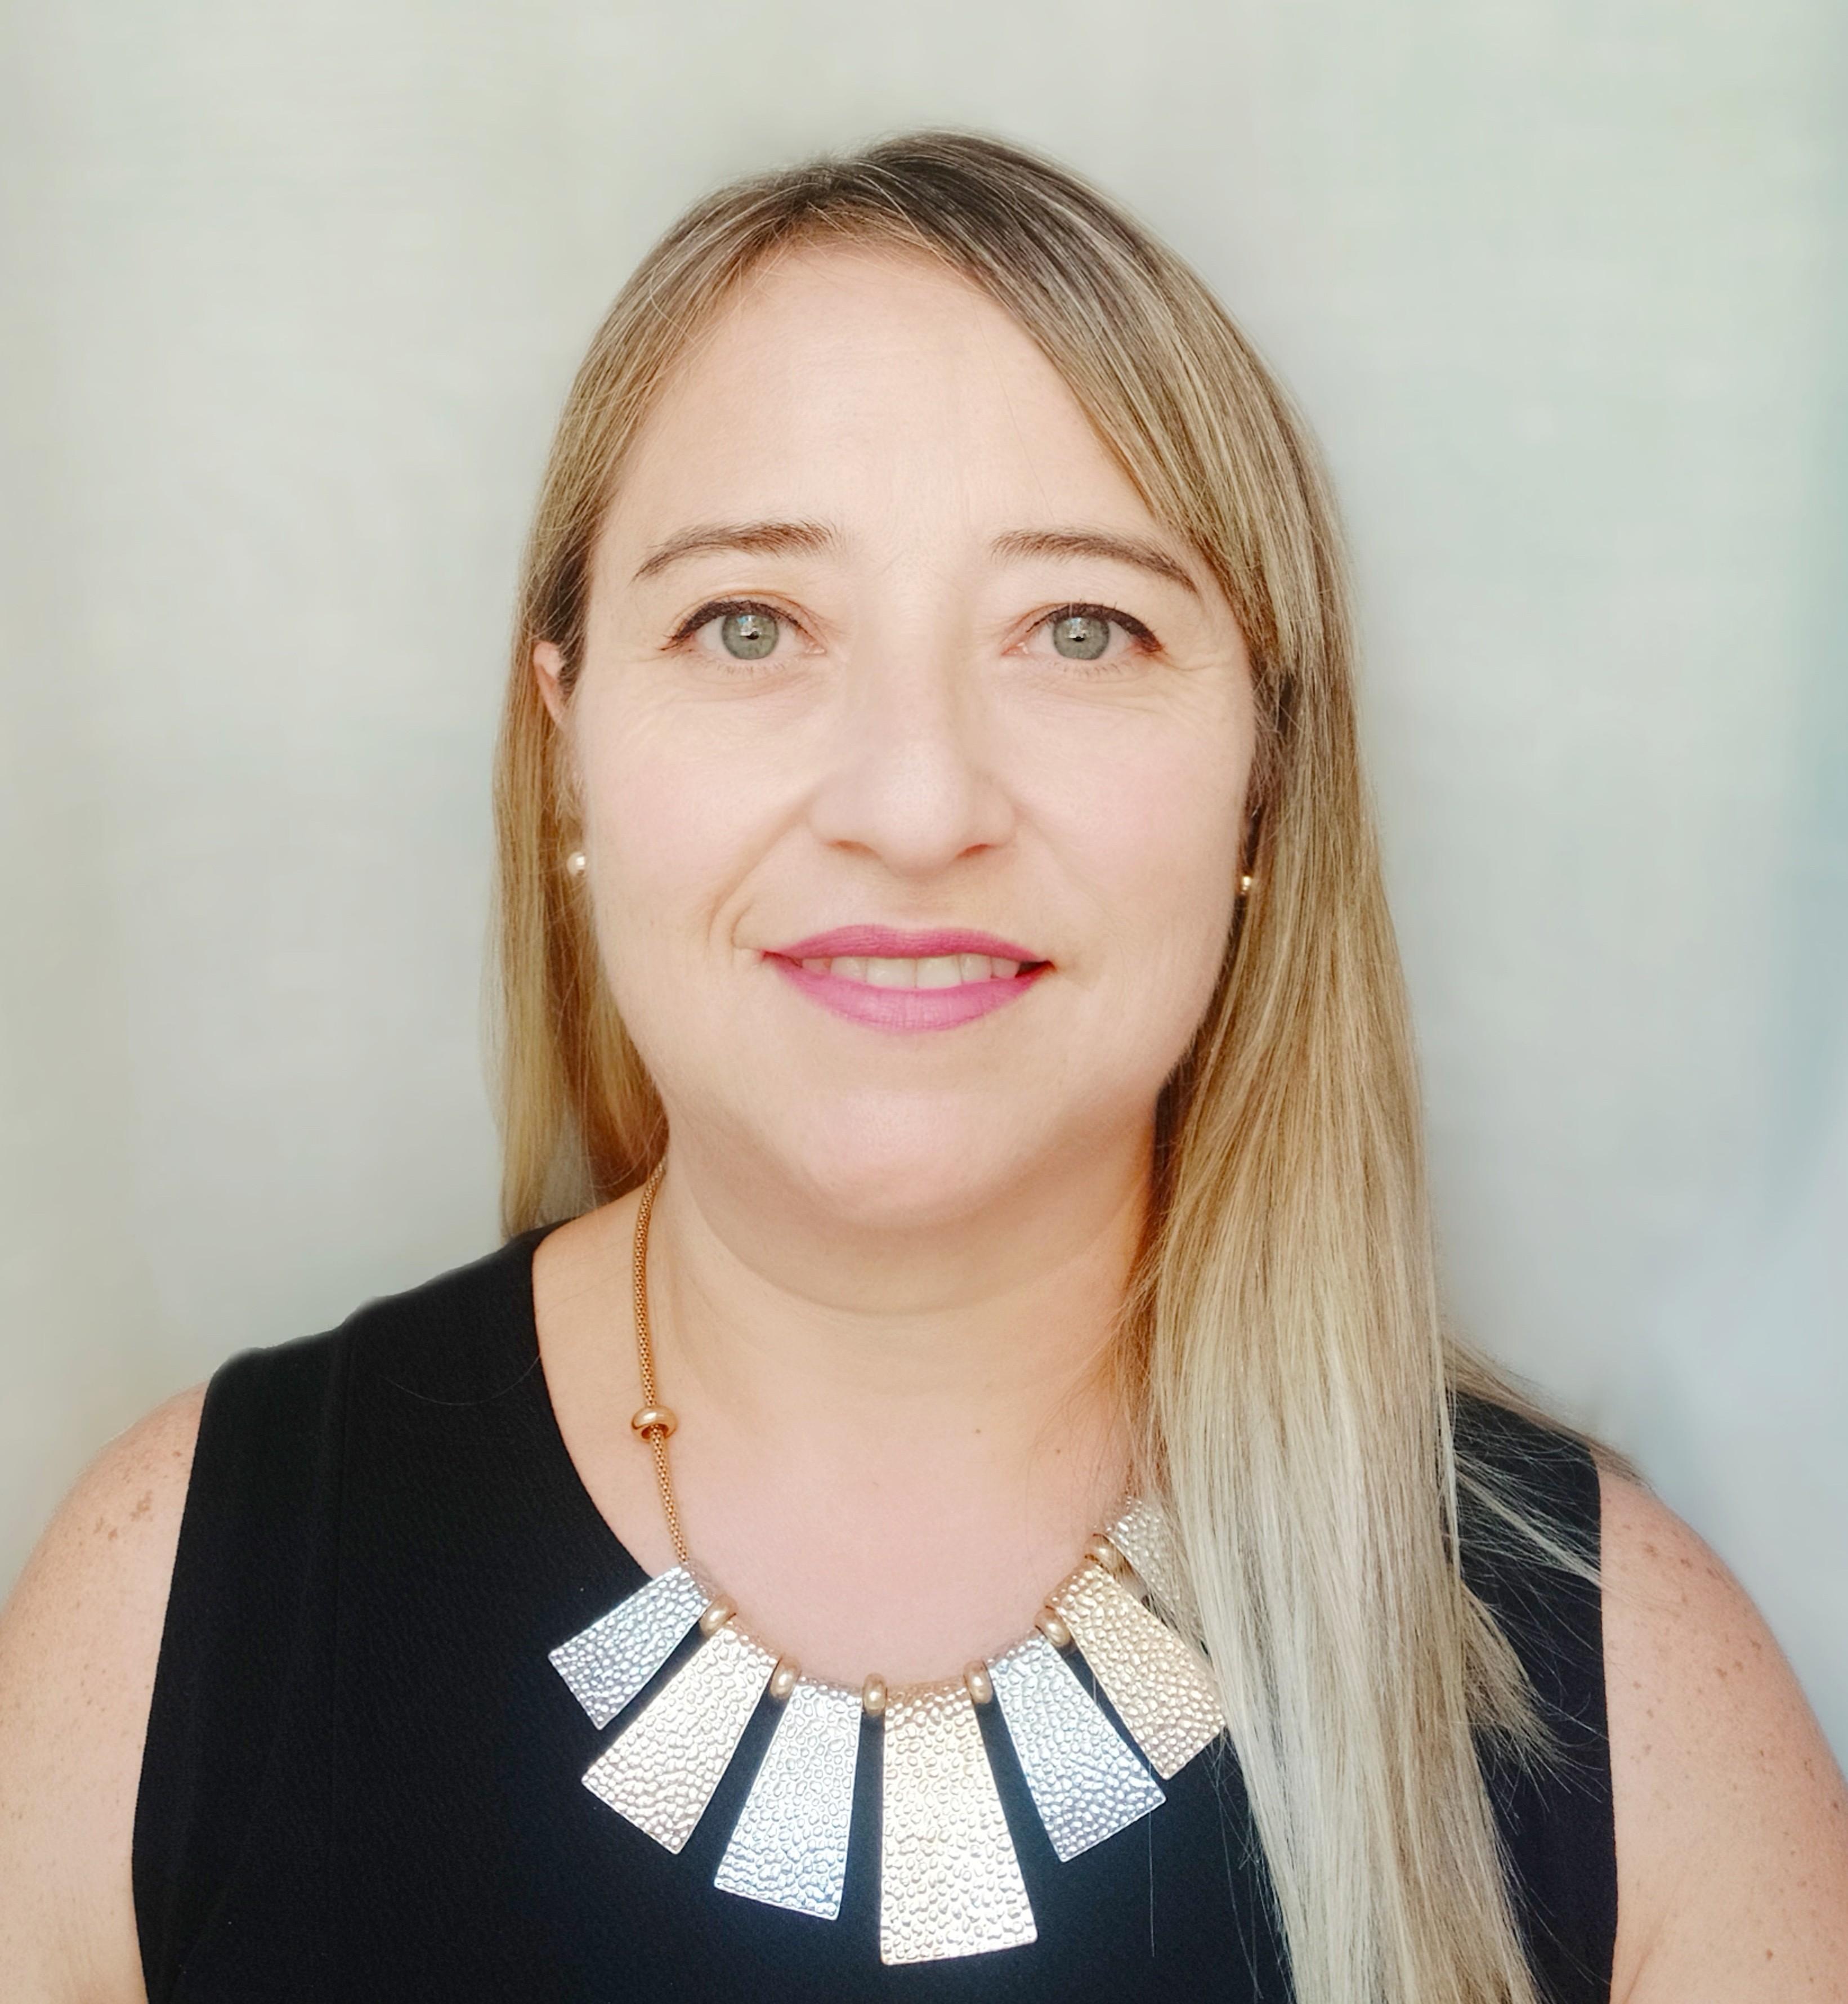 Jessica Acuña Orellana